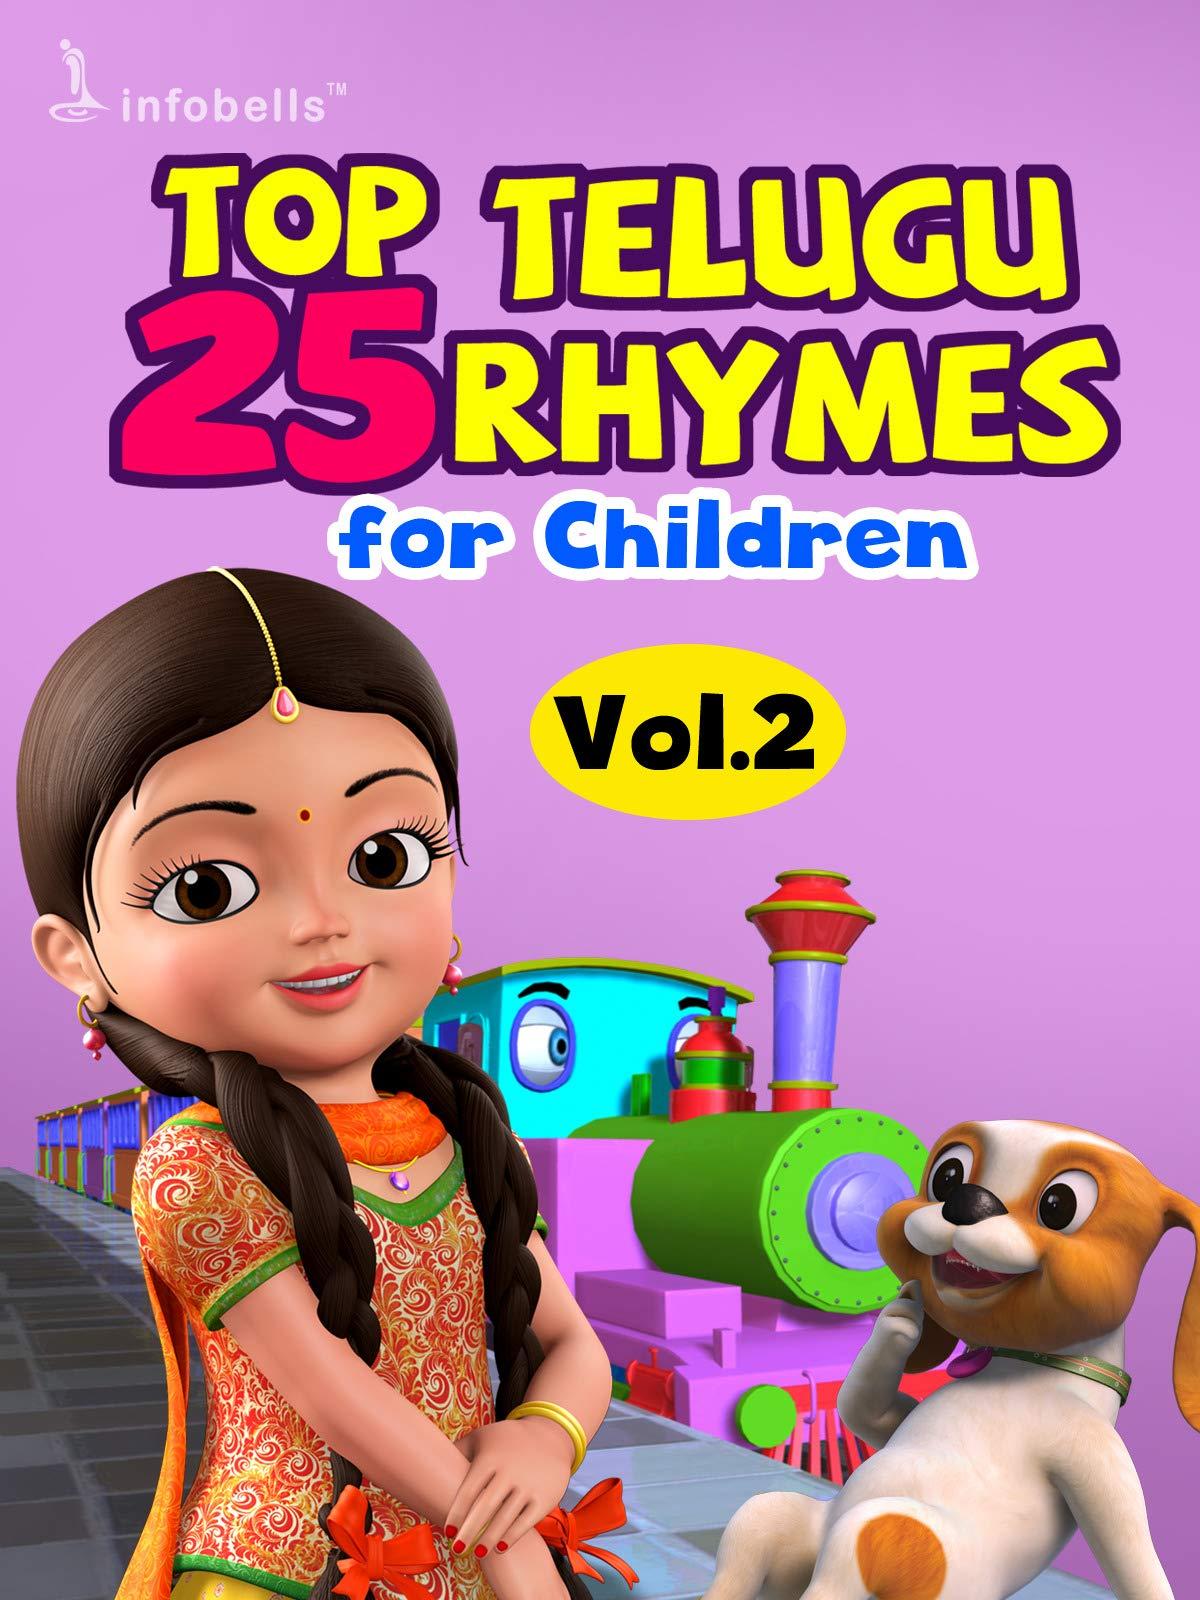 Top 25 Telugu Rhymes for Children Vol. 2 on Amazon Prime Video UK